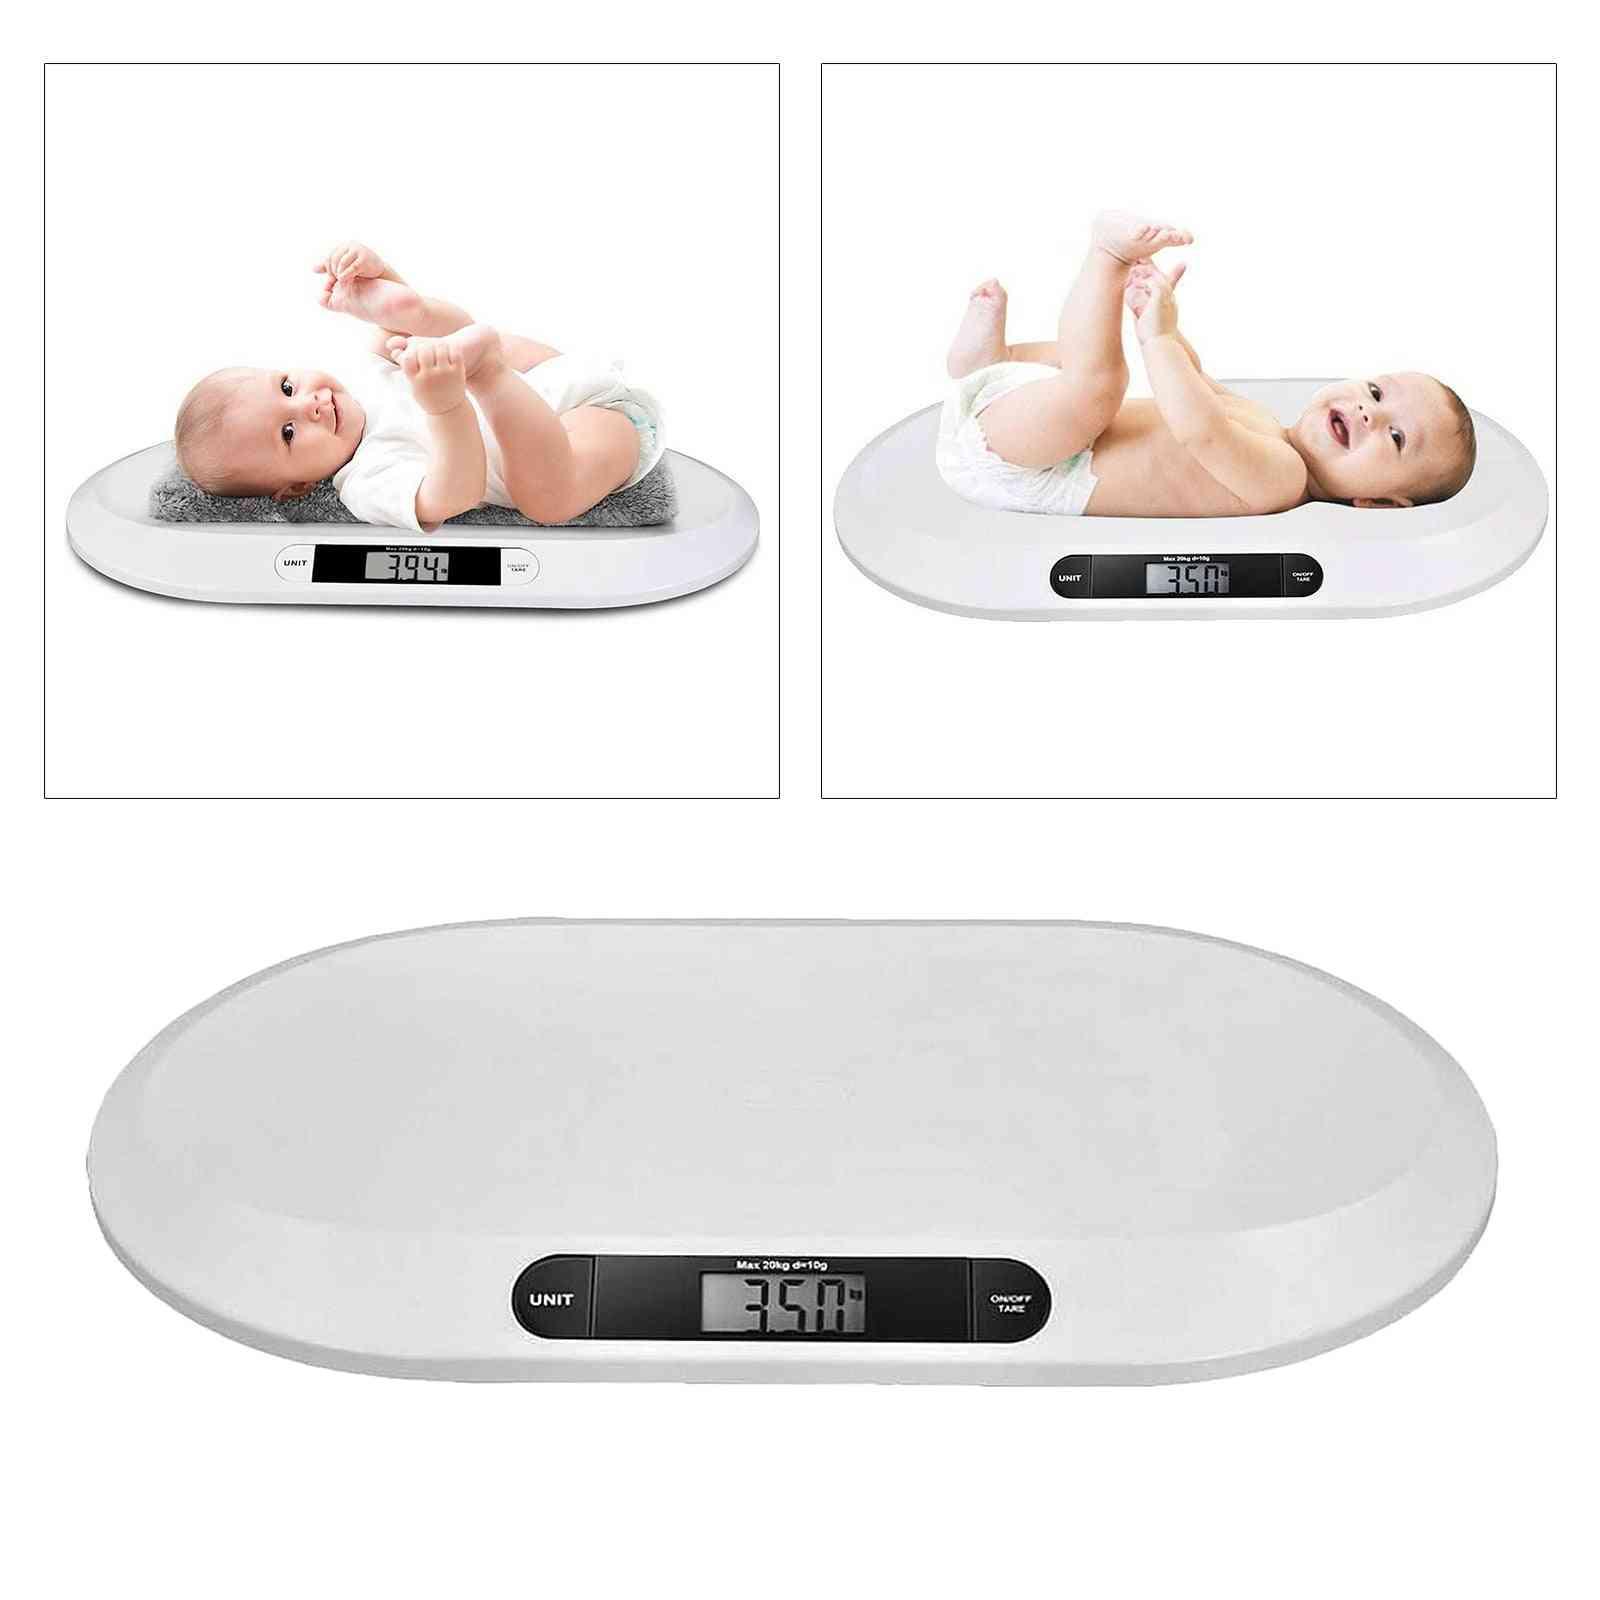 Digital Baby Scale Ugraded Family Digital Scale